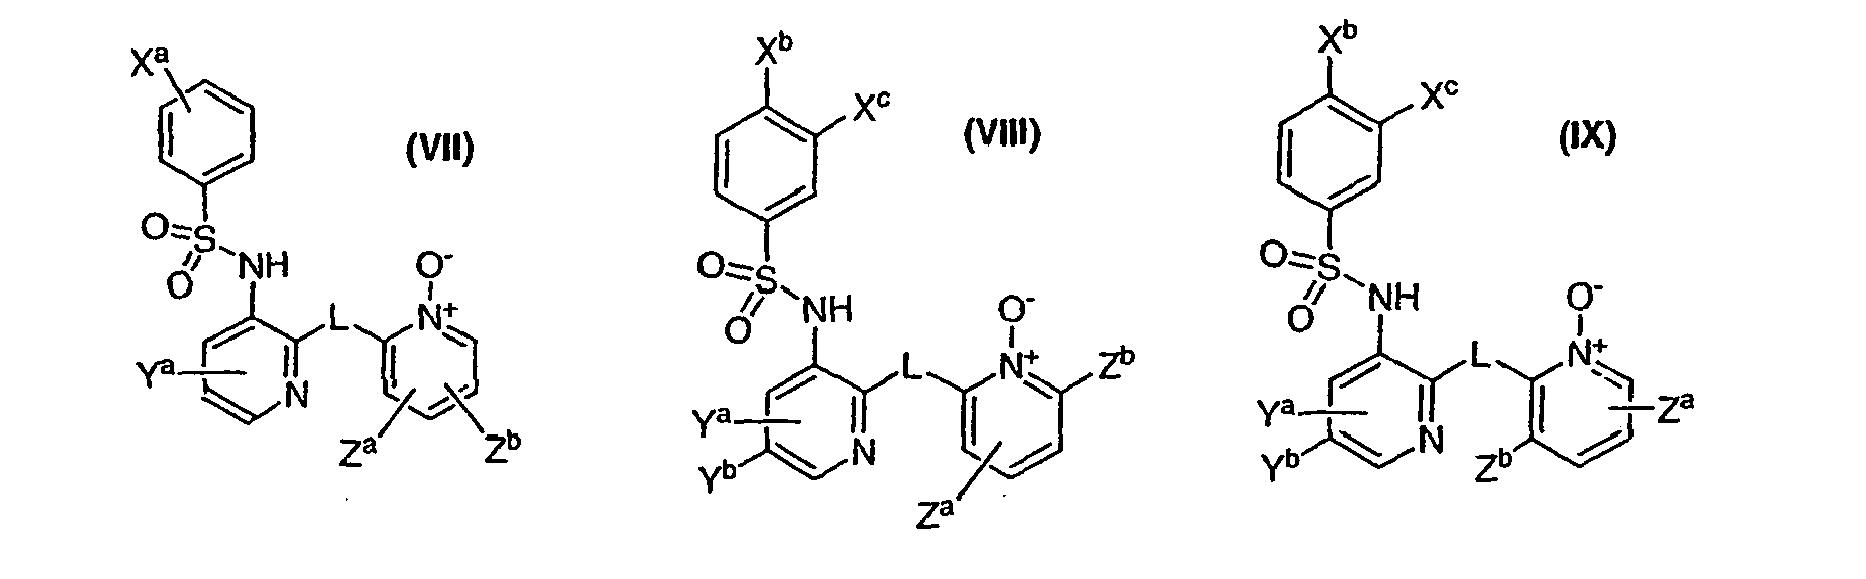 Figure imgb0011